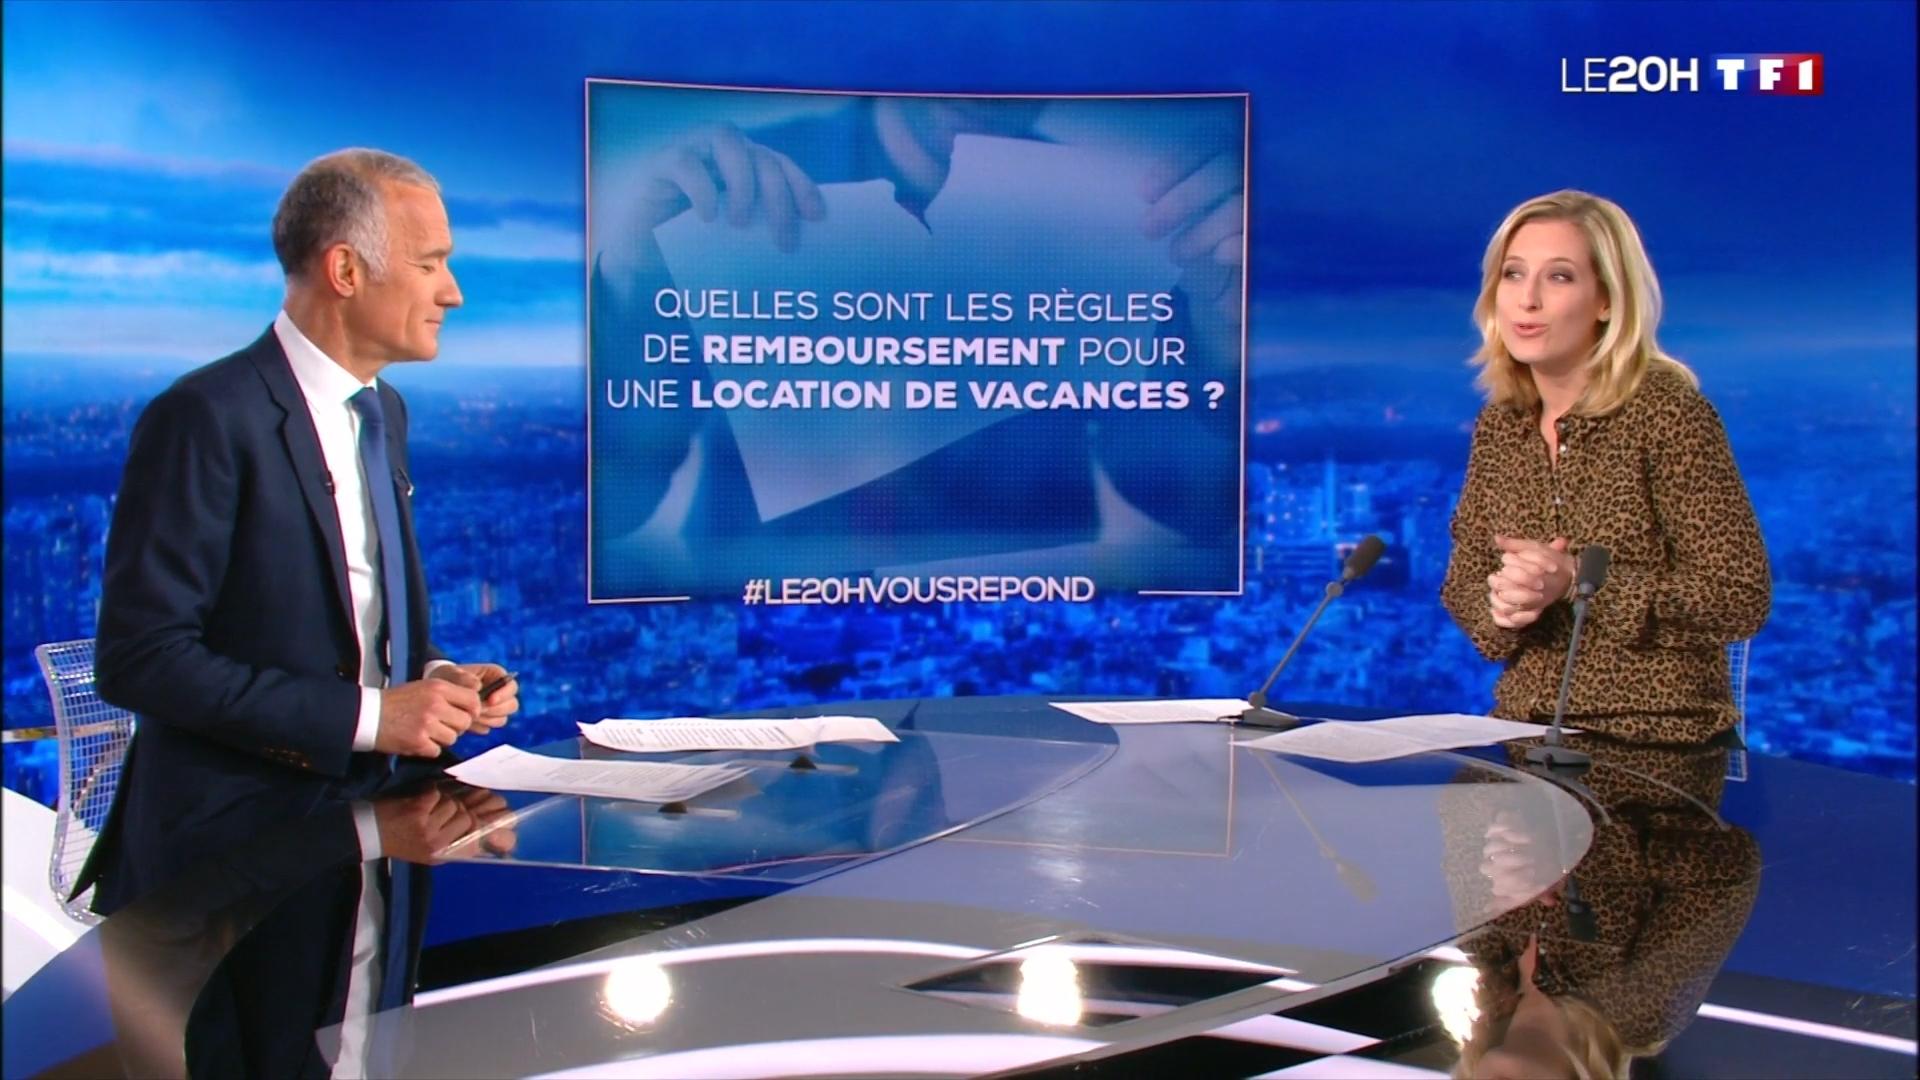 2021-02-10_20_00_TF1_Le-20h.mp4_snapshot_00.44.14.320.jpg